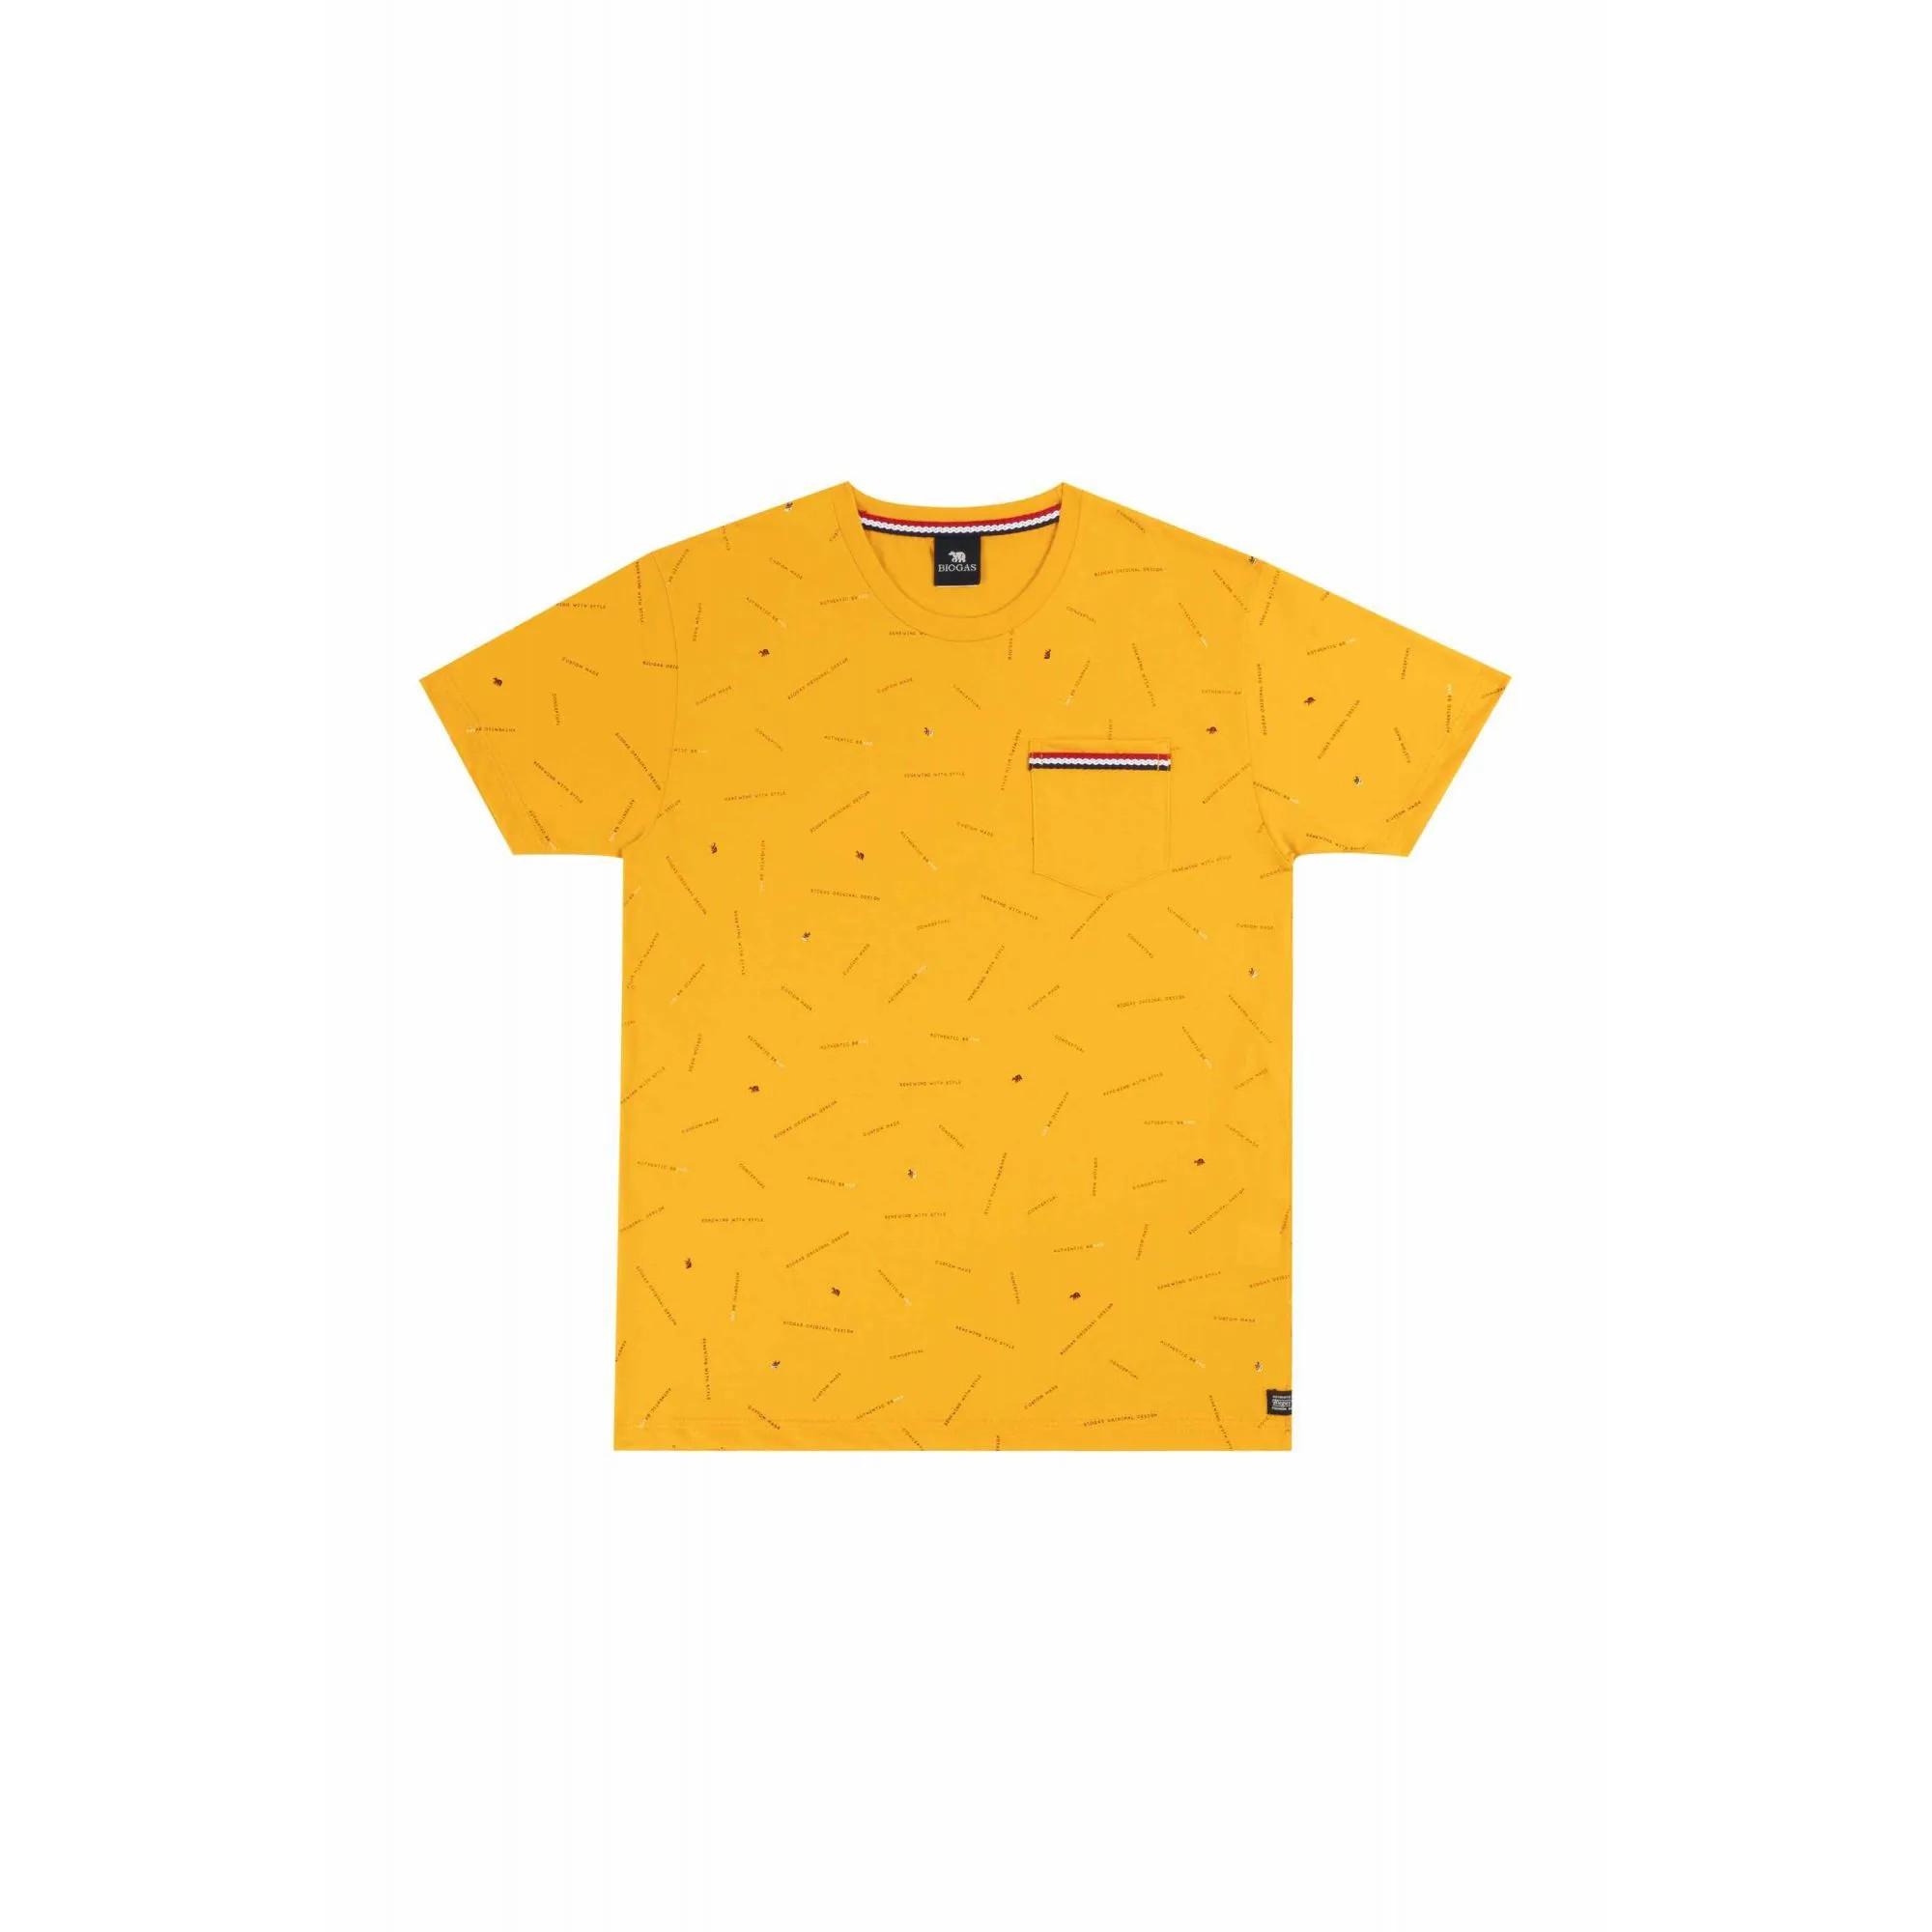 Camiseta Masculino Tr Juv Bg Amarelo 30079